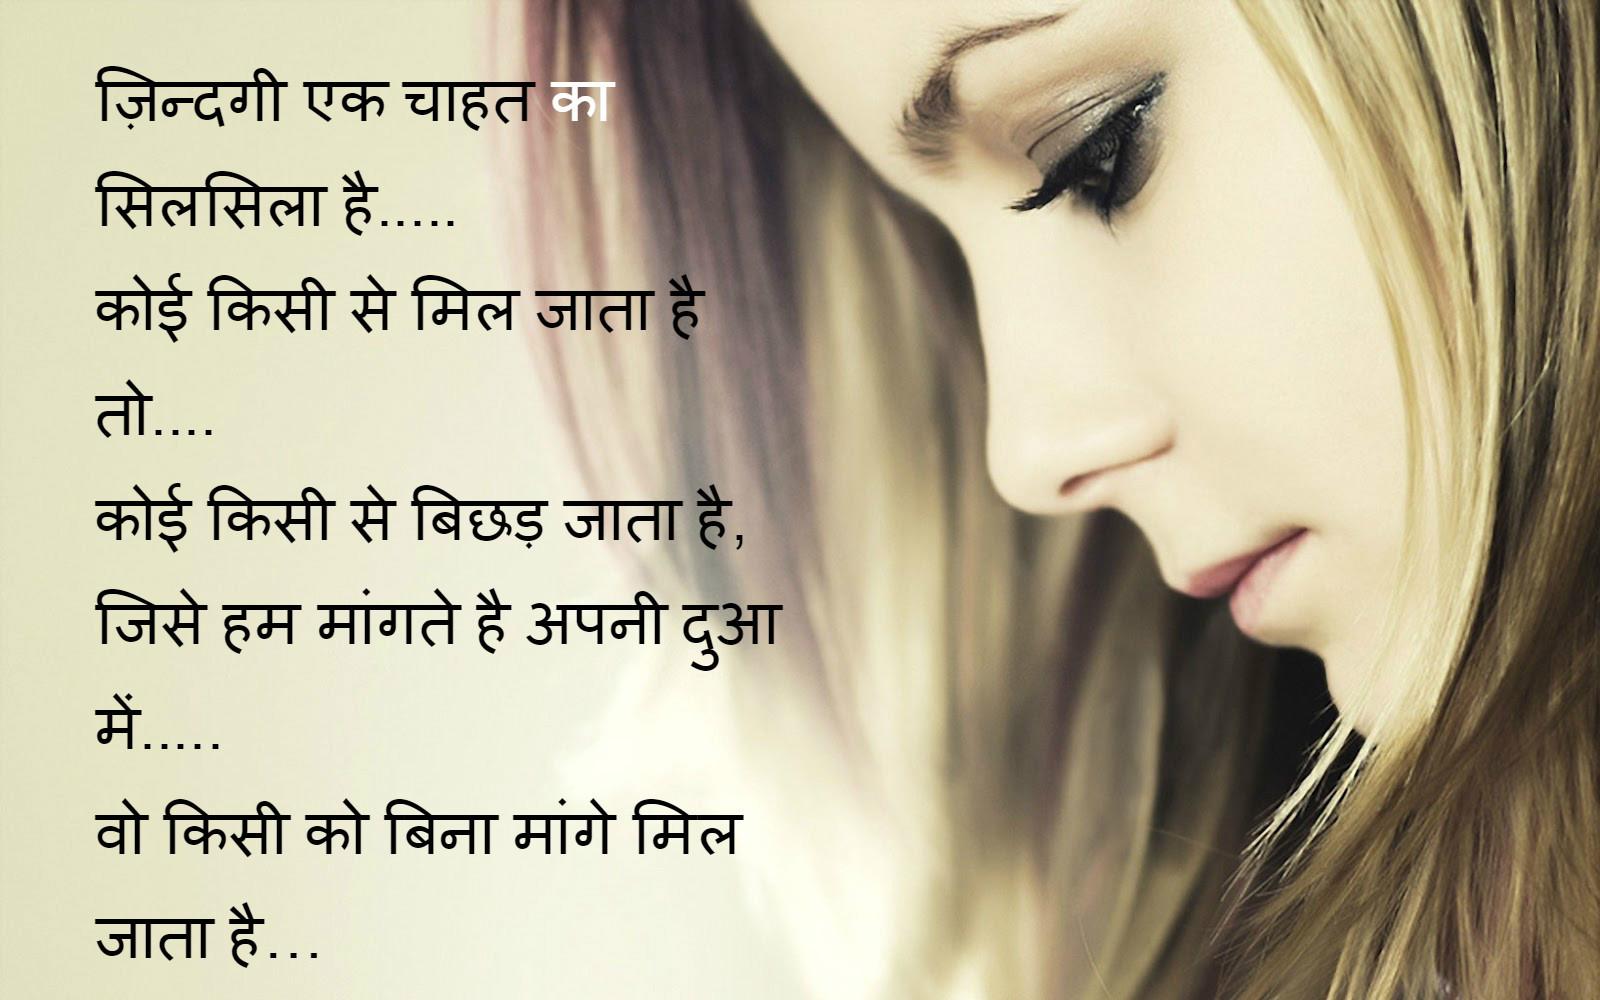 Shayari images on hd image